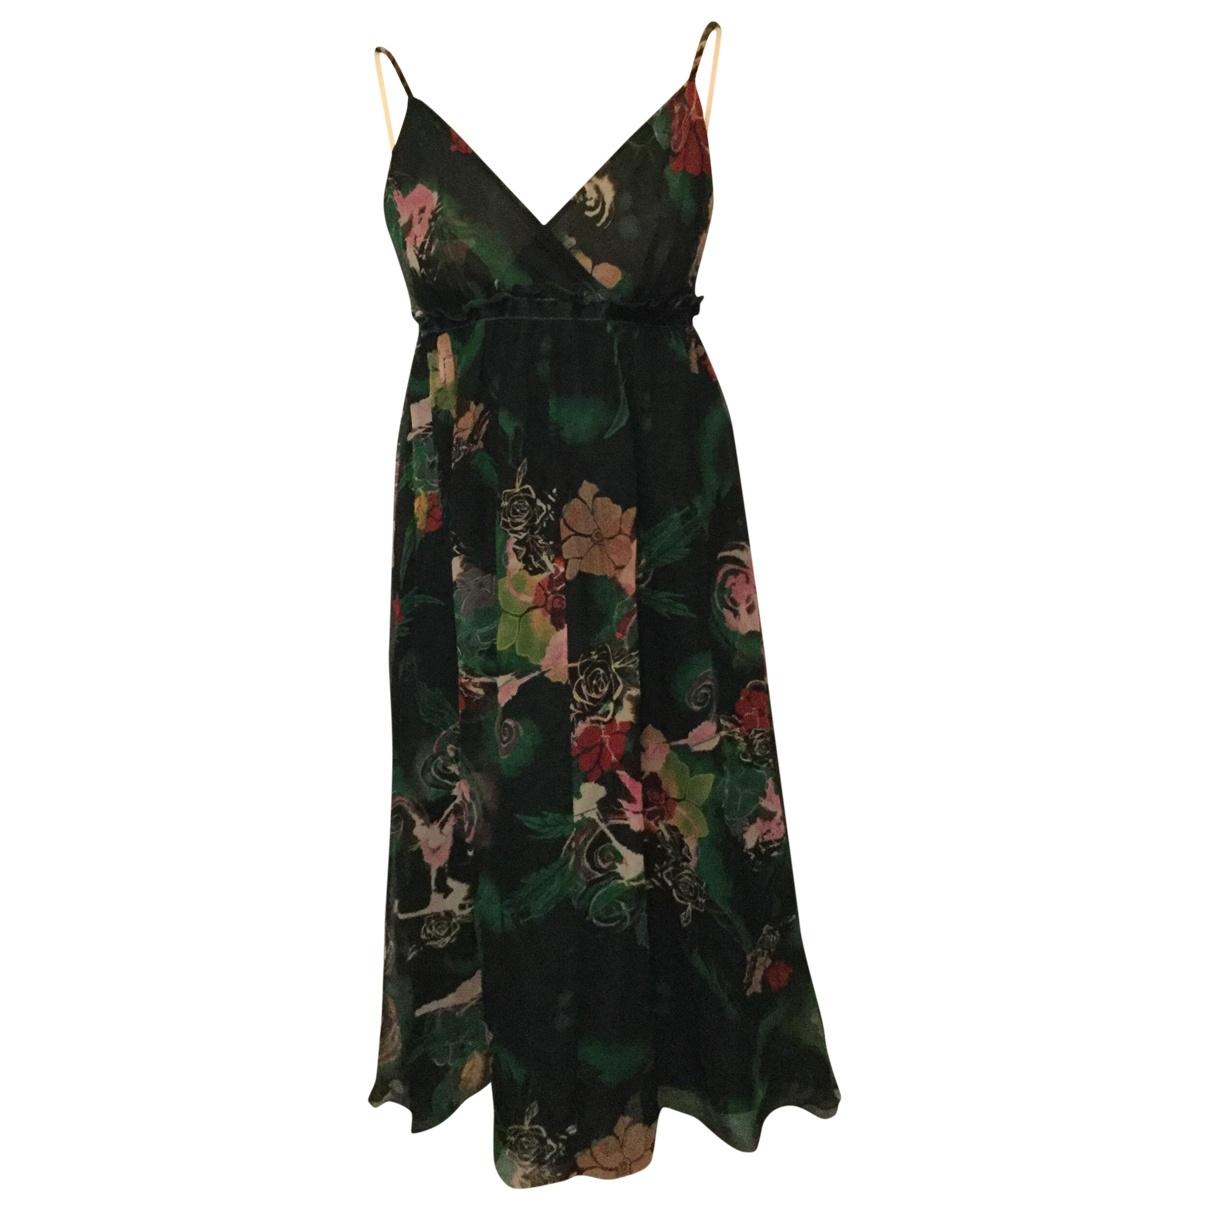 Les Petites \N Green Silk dress for Women 1 0-5